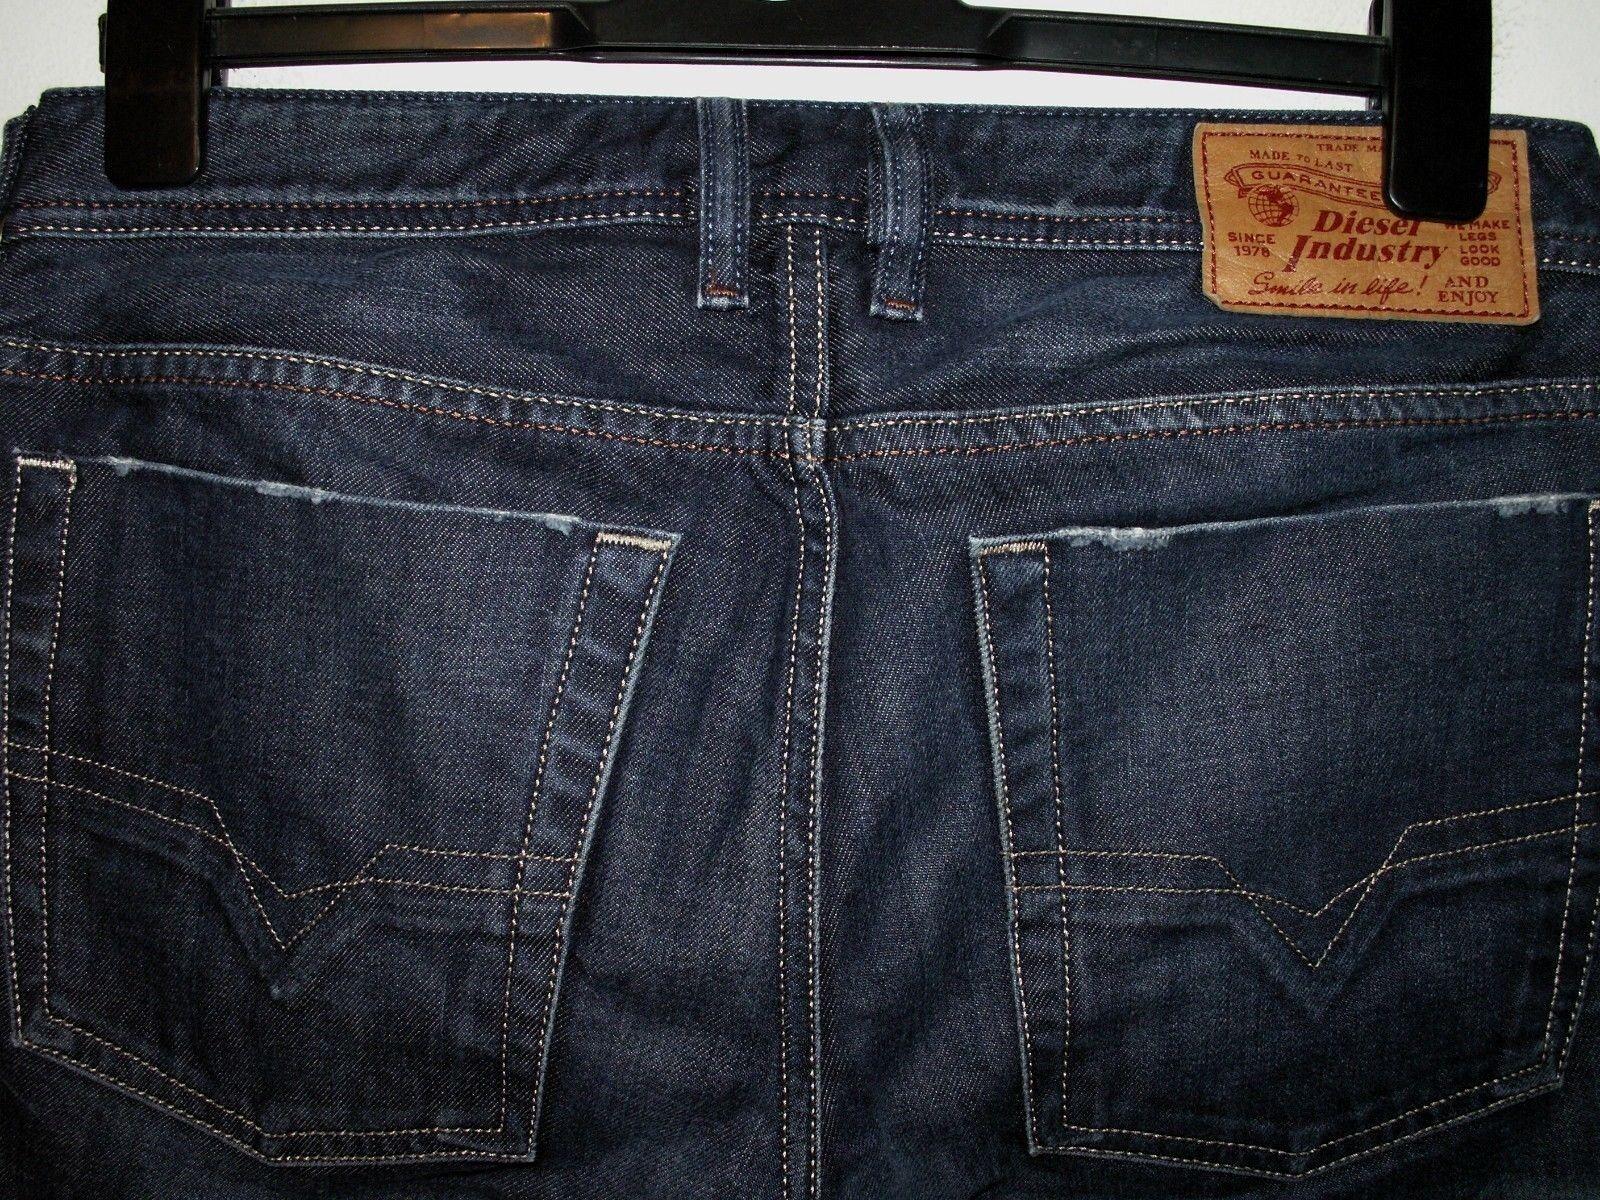 a3e6a45d Absolut Joy VI-P2923A jeans Men's - colour Grey IENUDIE JEANS TIGHT LONG  JOHN BROKEN USED ORGANIC MEN'S DENIM JEANS size W28 L32